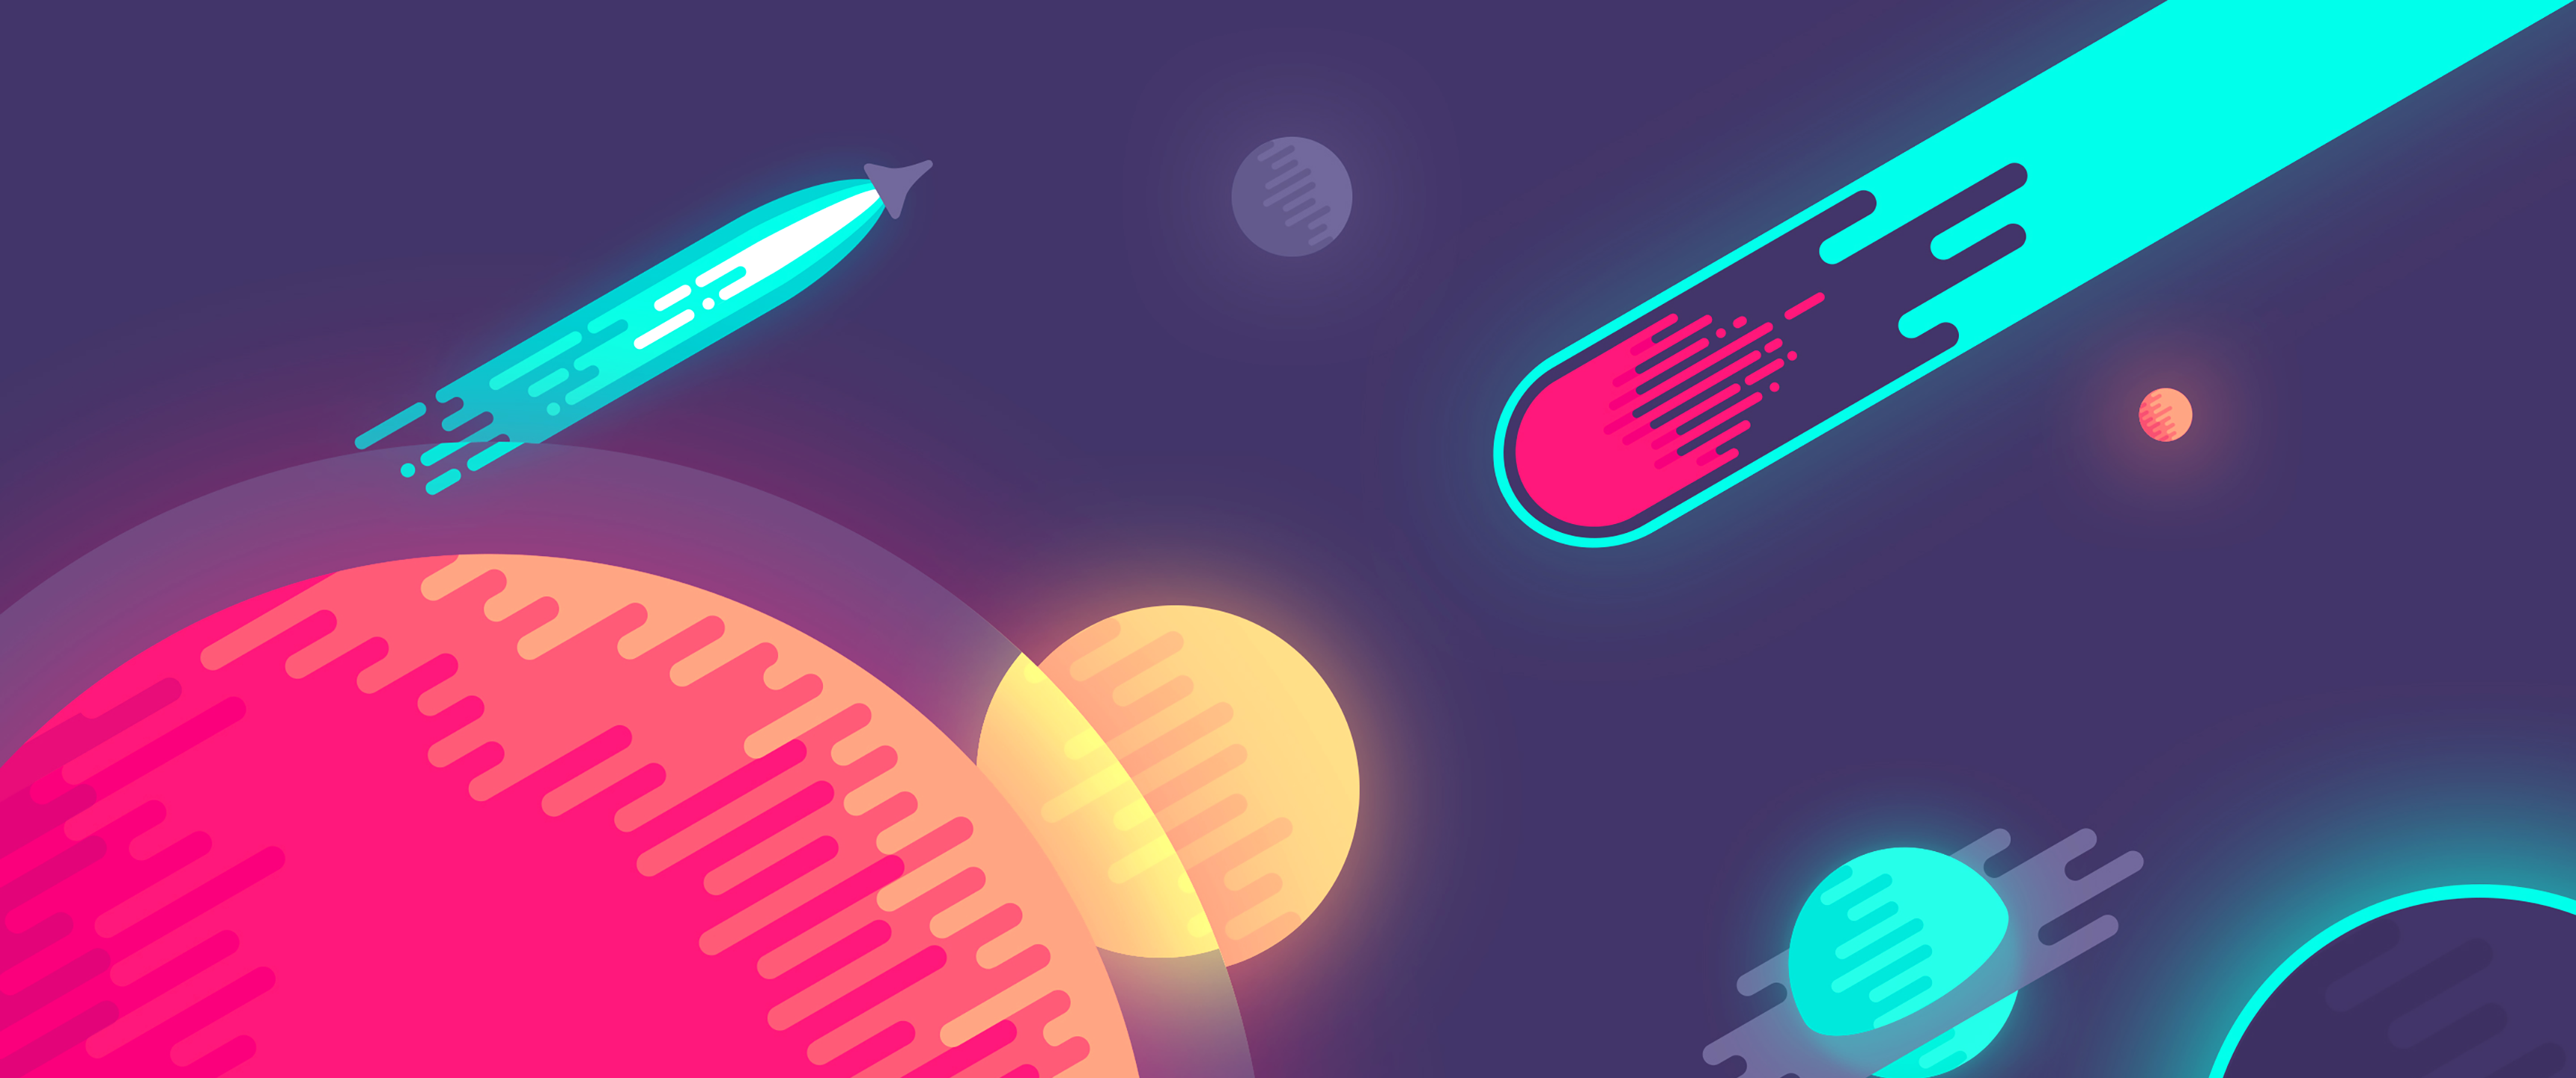 Simple 4k Wallpaper Reddit Gallery In 2020 Wallpaper Space Space Illustration Space Art